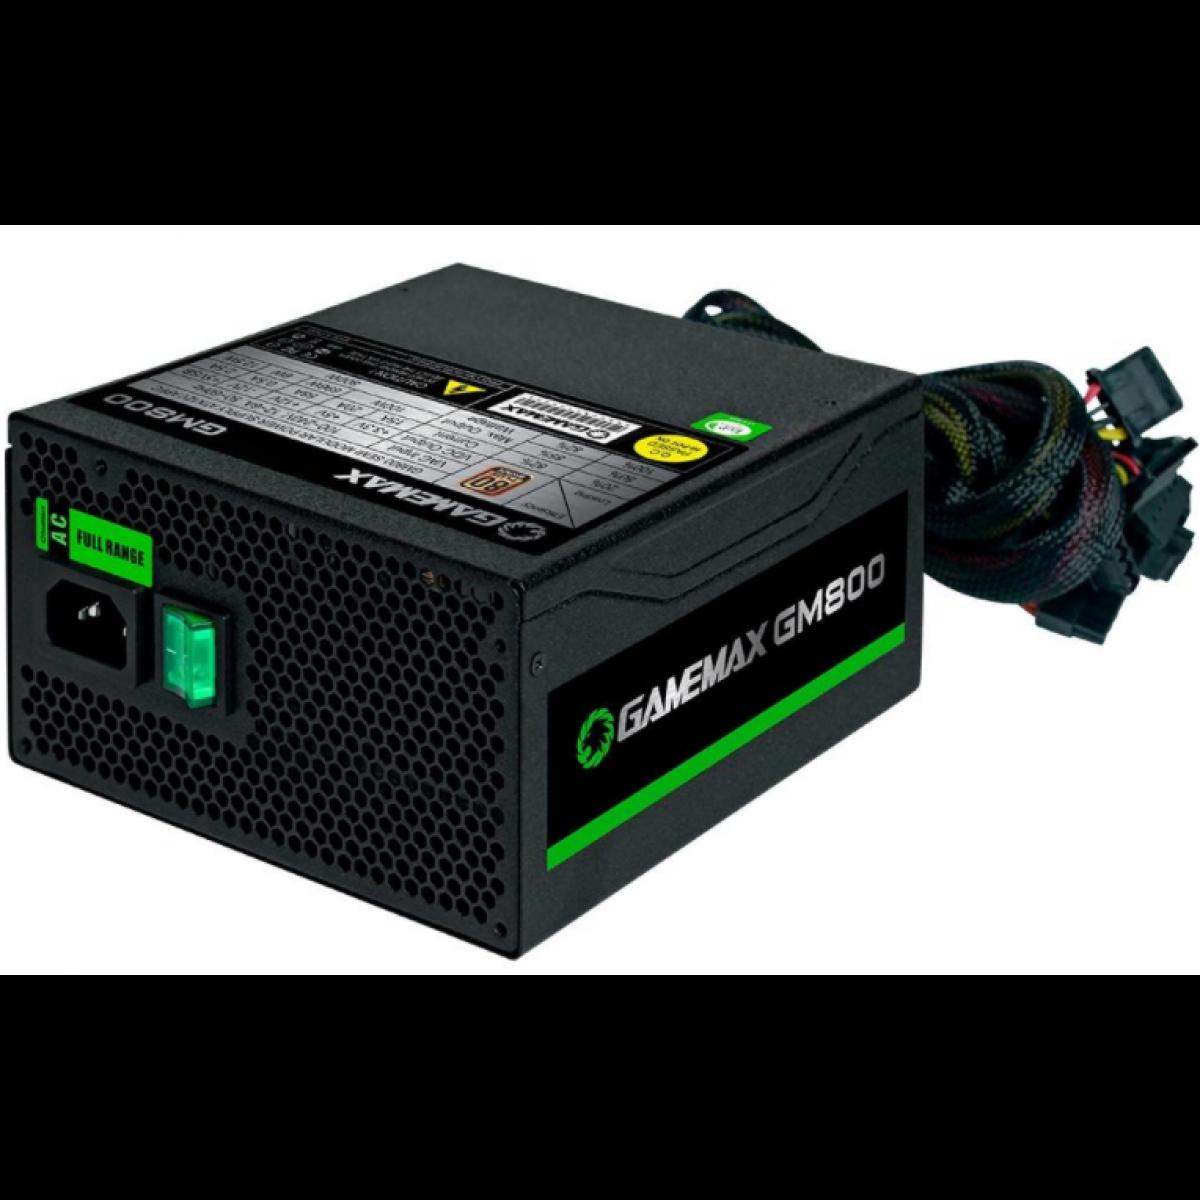 Fonte Gamemax GM800 800W, 80 Plus Bronze, PFC Ativo